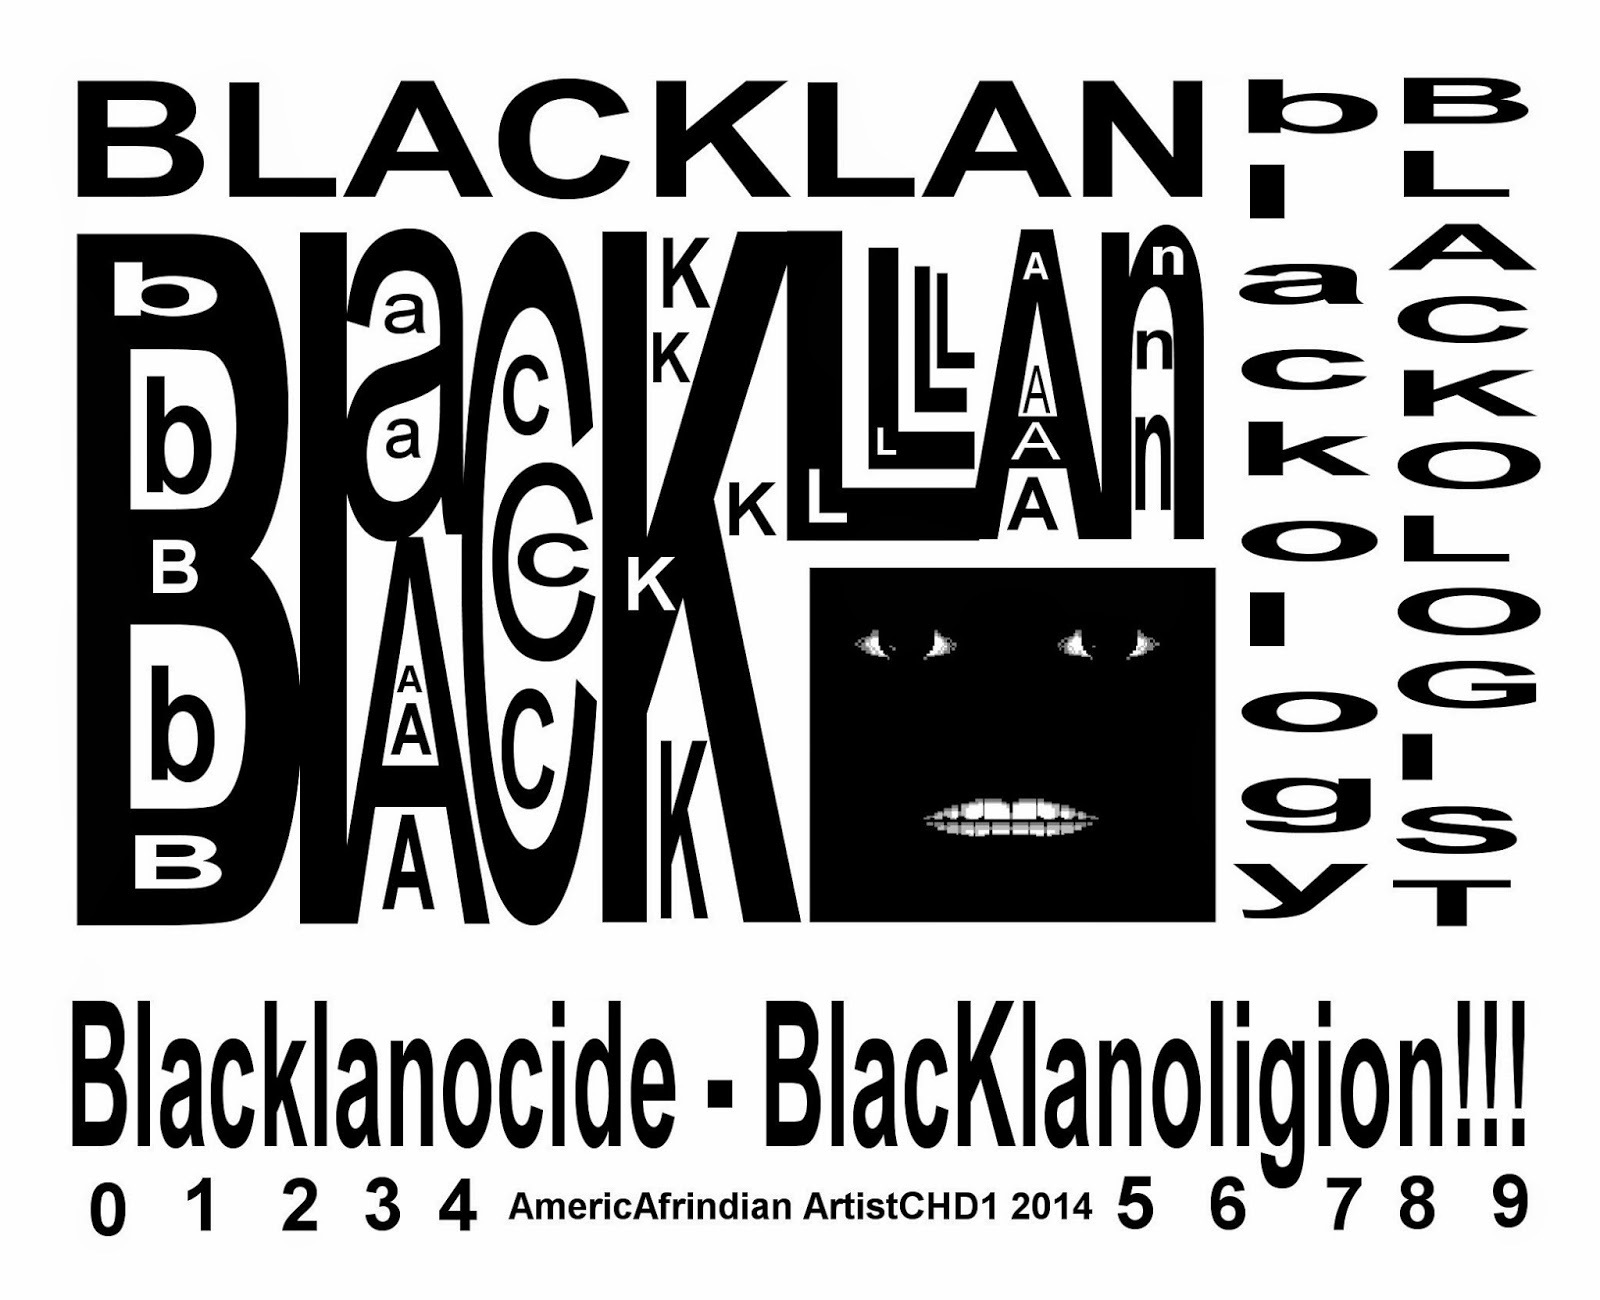 Blacklan Blacklanology Black Klan White Klan Blacklanocide